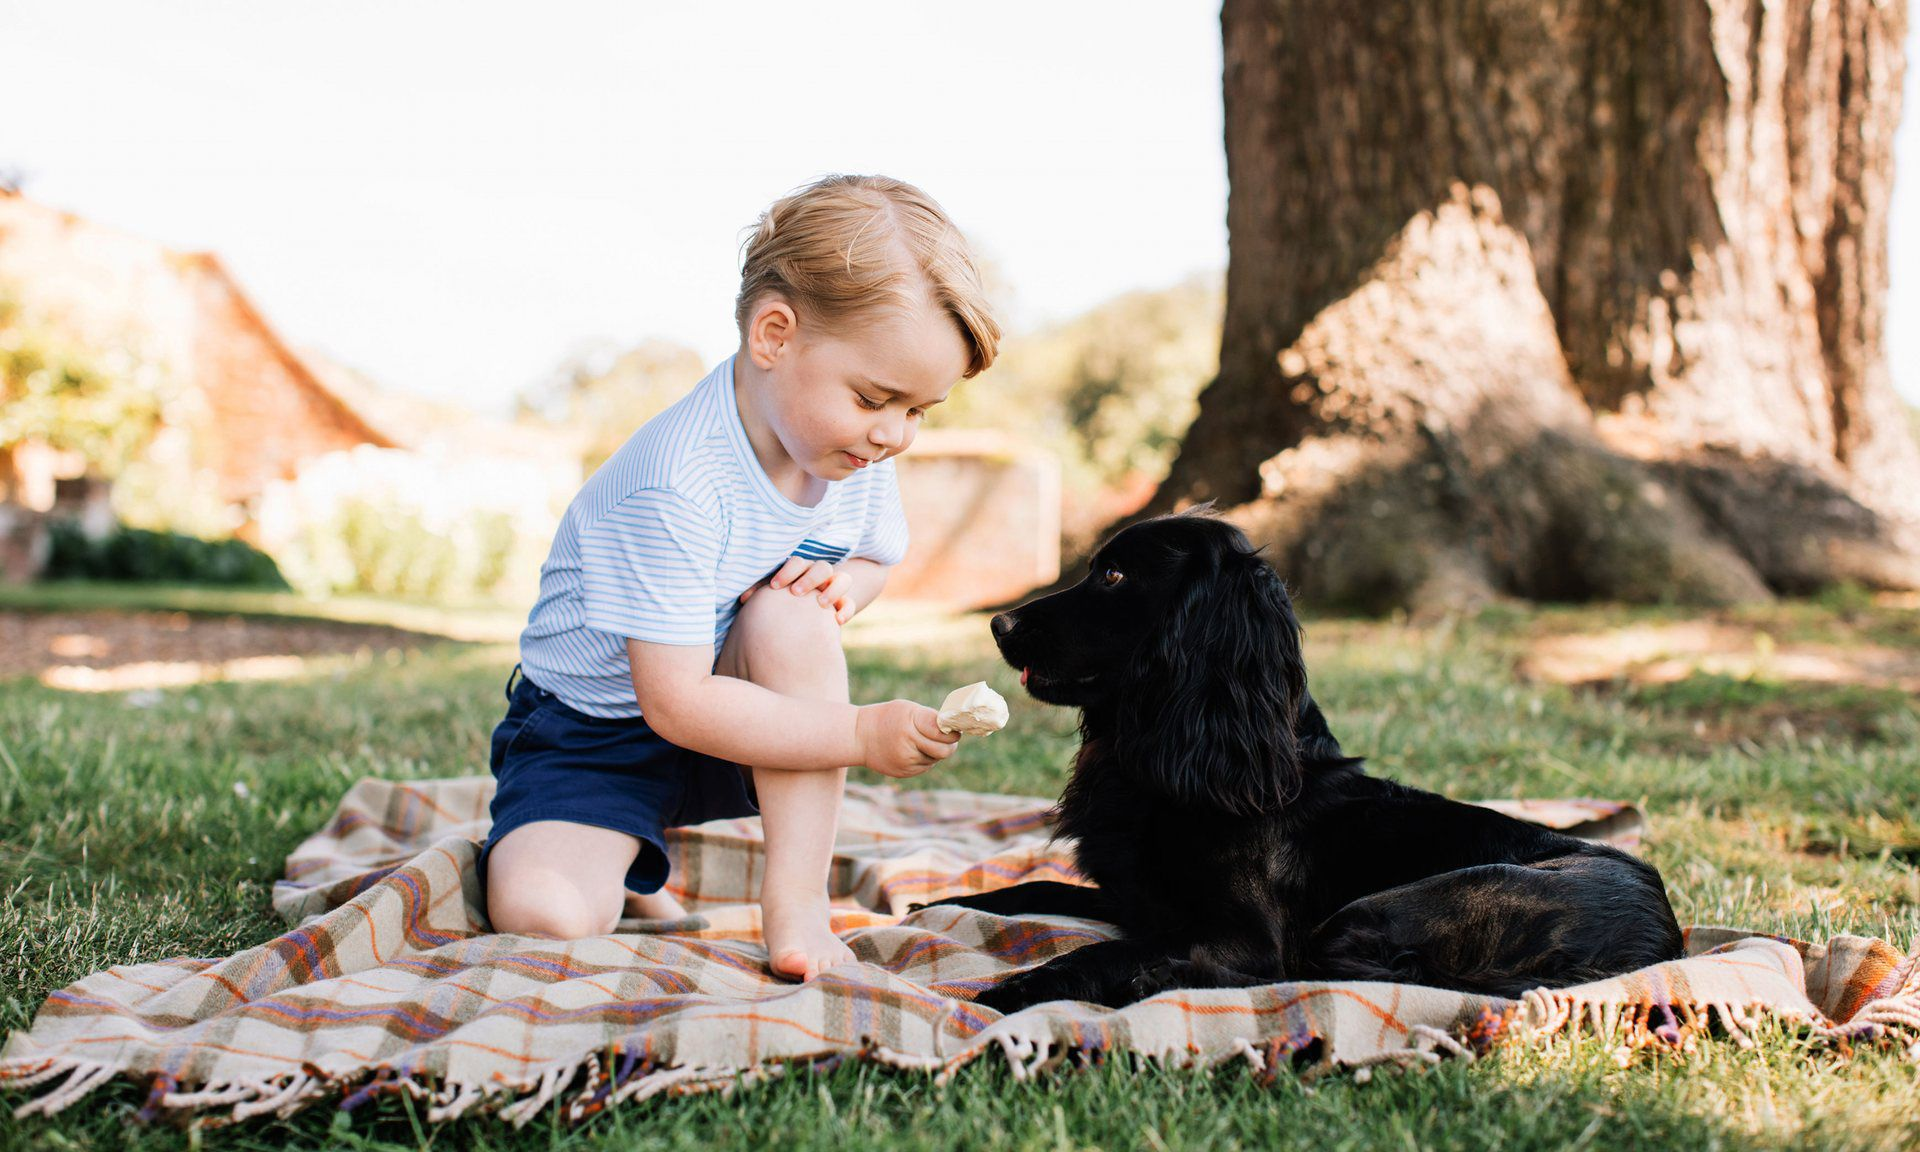 Prince George's original best friend.